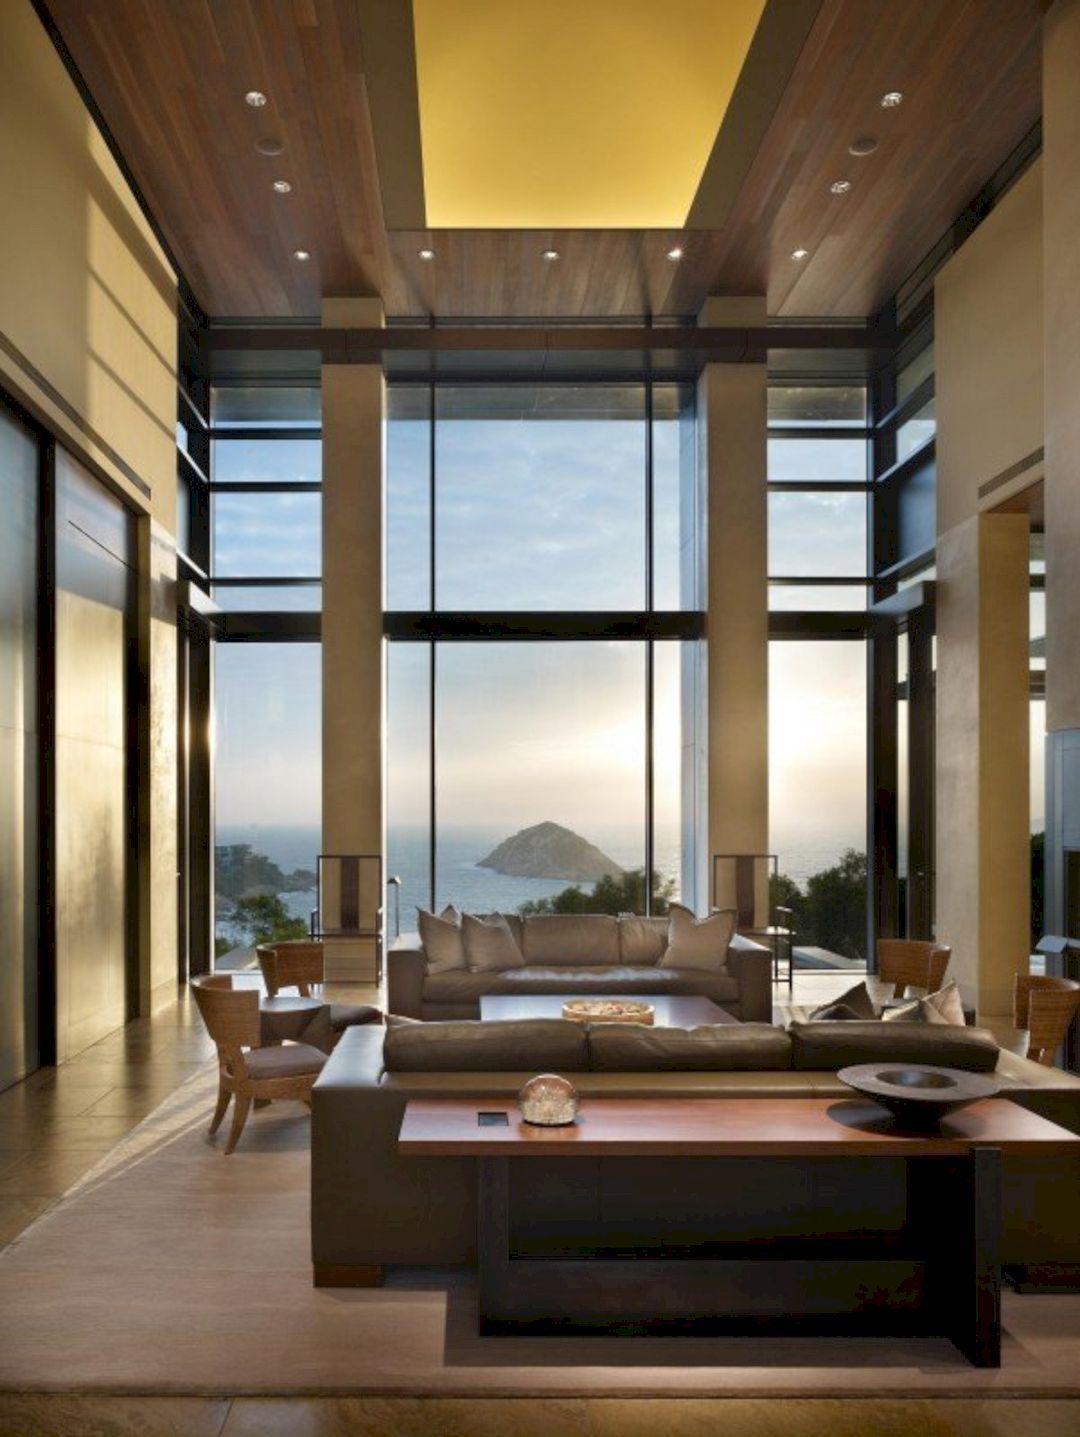 Hong Kong Villa Interiors: Modern Interior Design with ... Hong Kong Modern House Design on japan modern house design, mexico modern house design, kenya modern house design, pinoy modern house design, chinese modern house design, city modern house design,